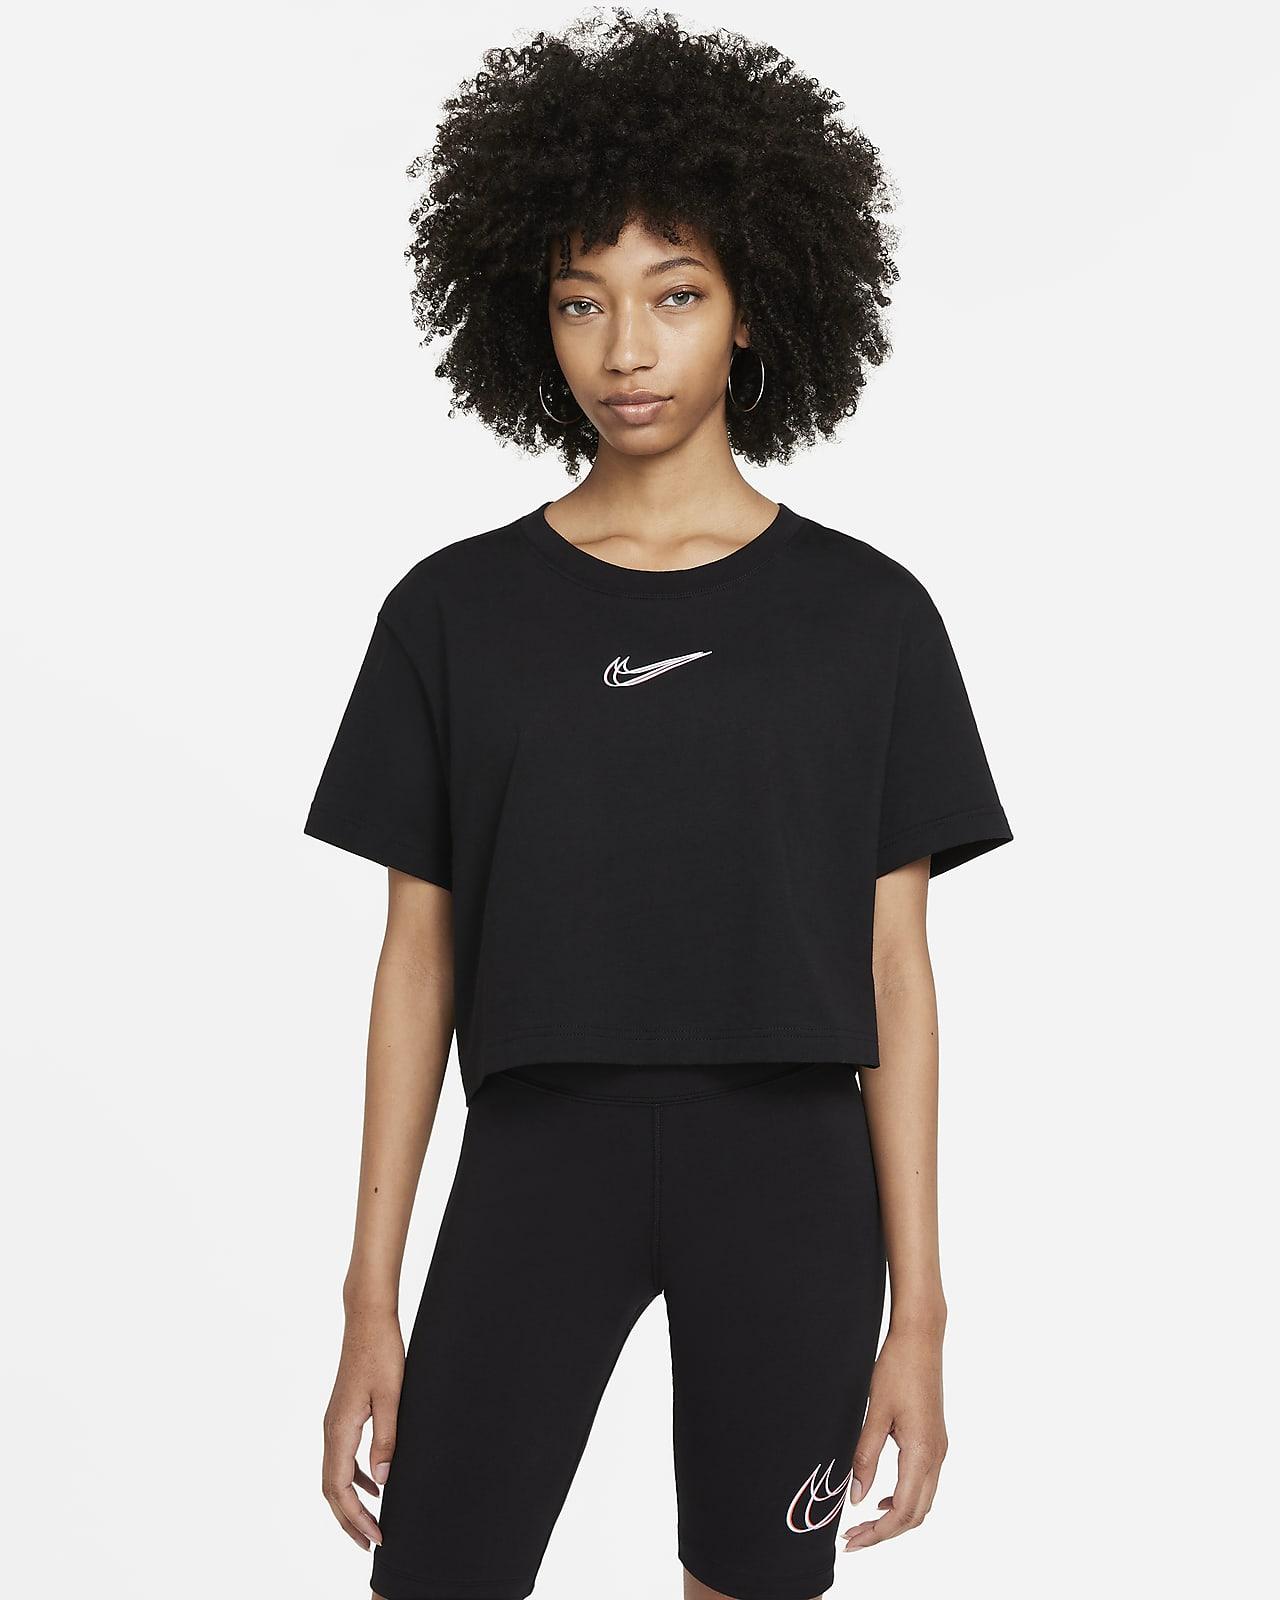 Tee-shirt de danse court Nike Sportswear pour Femme